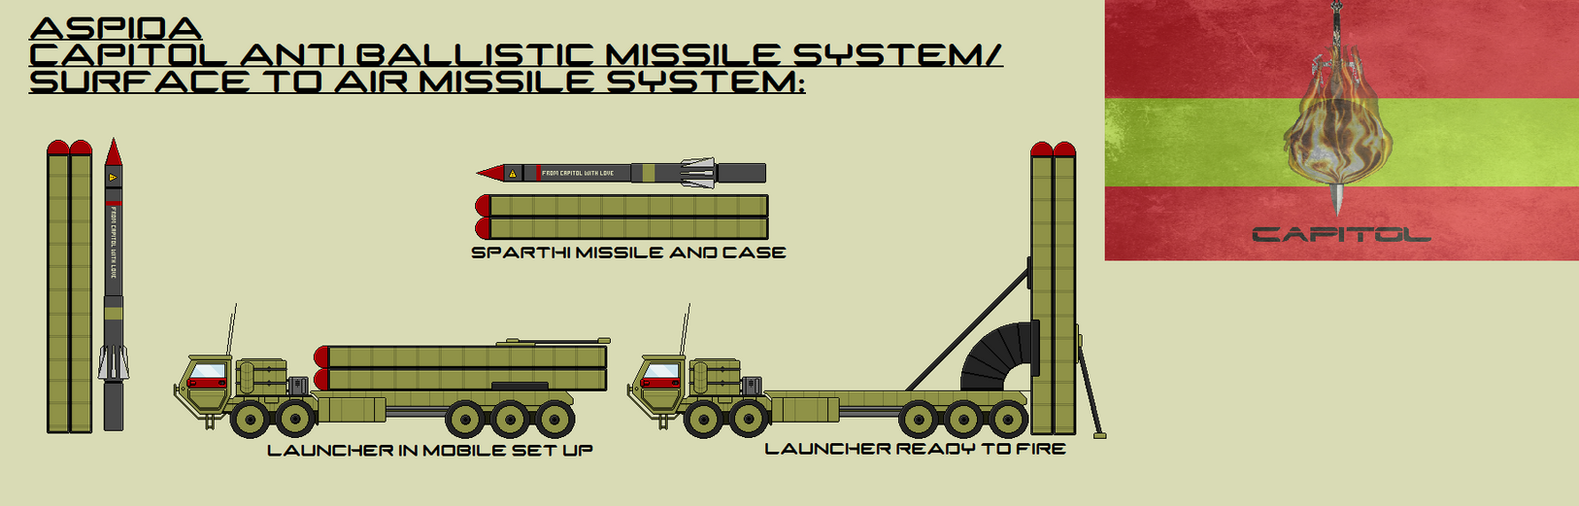 Aspida Capitol ABM/SAM System by EmperorMyric